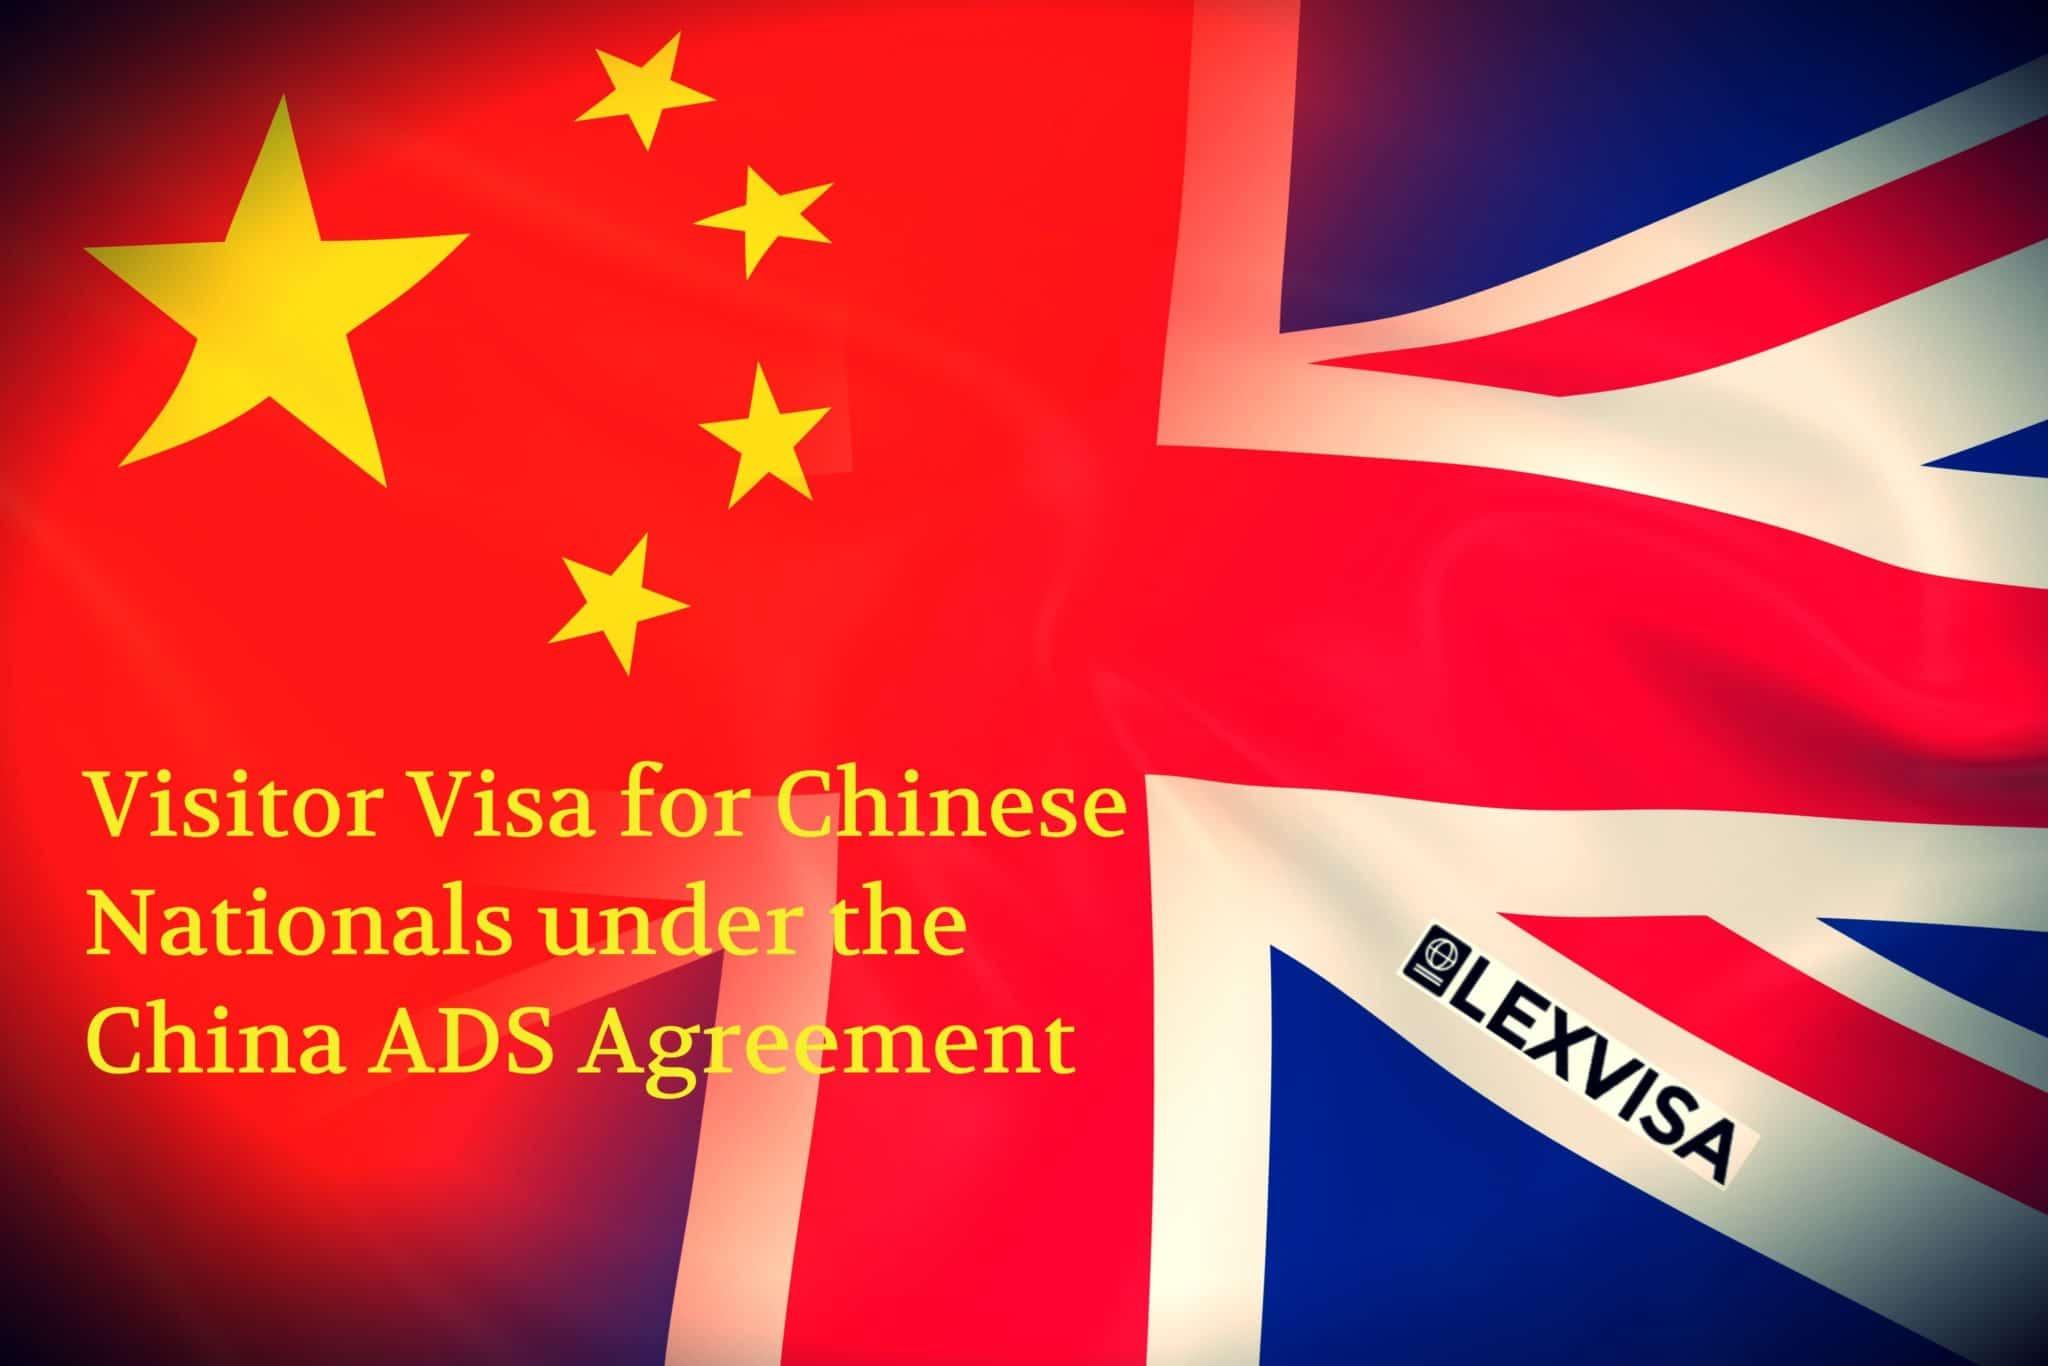 China ADS Agreement